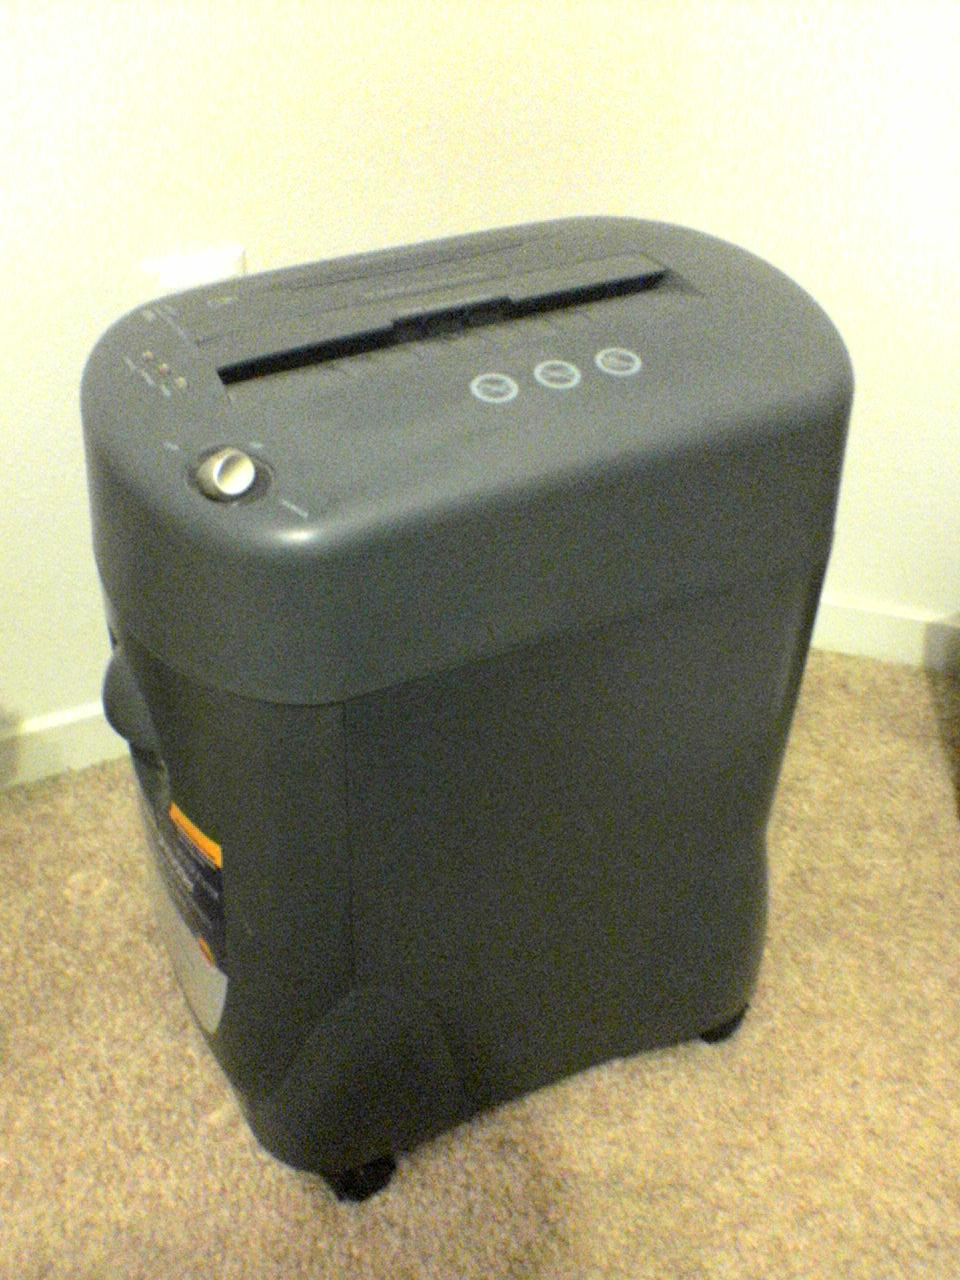 paper shredder wikipedia